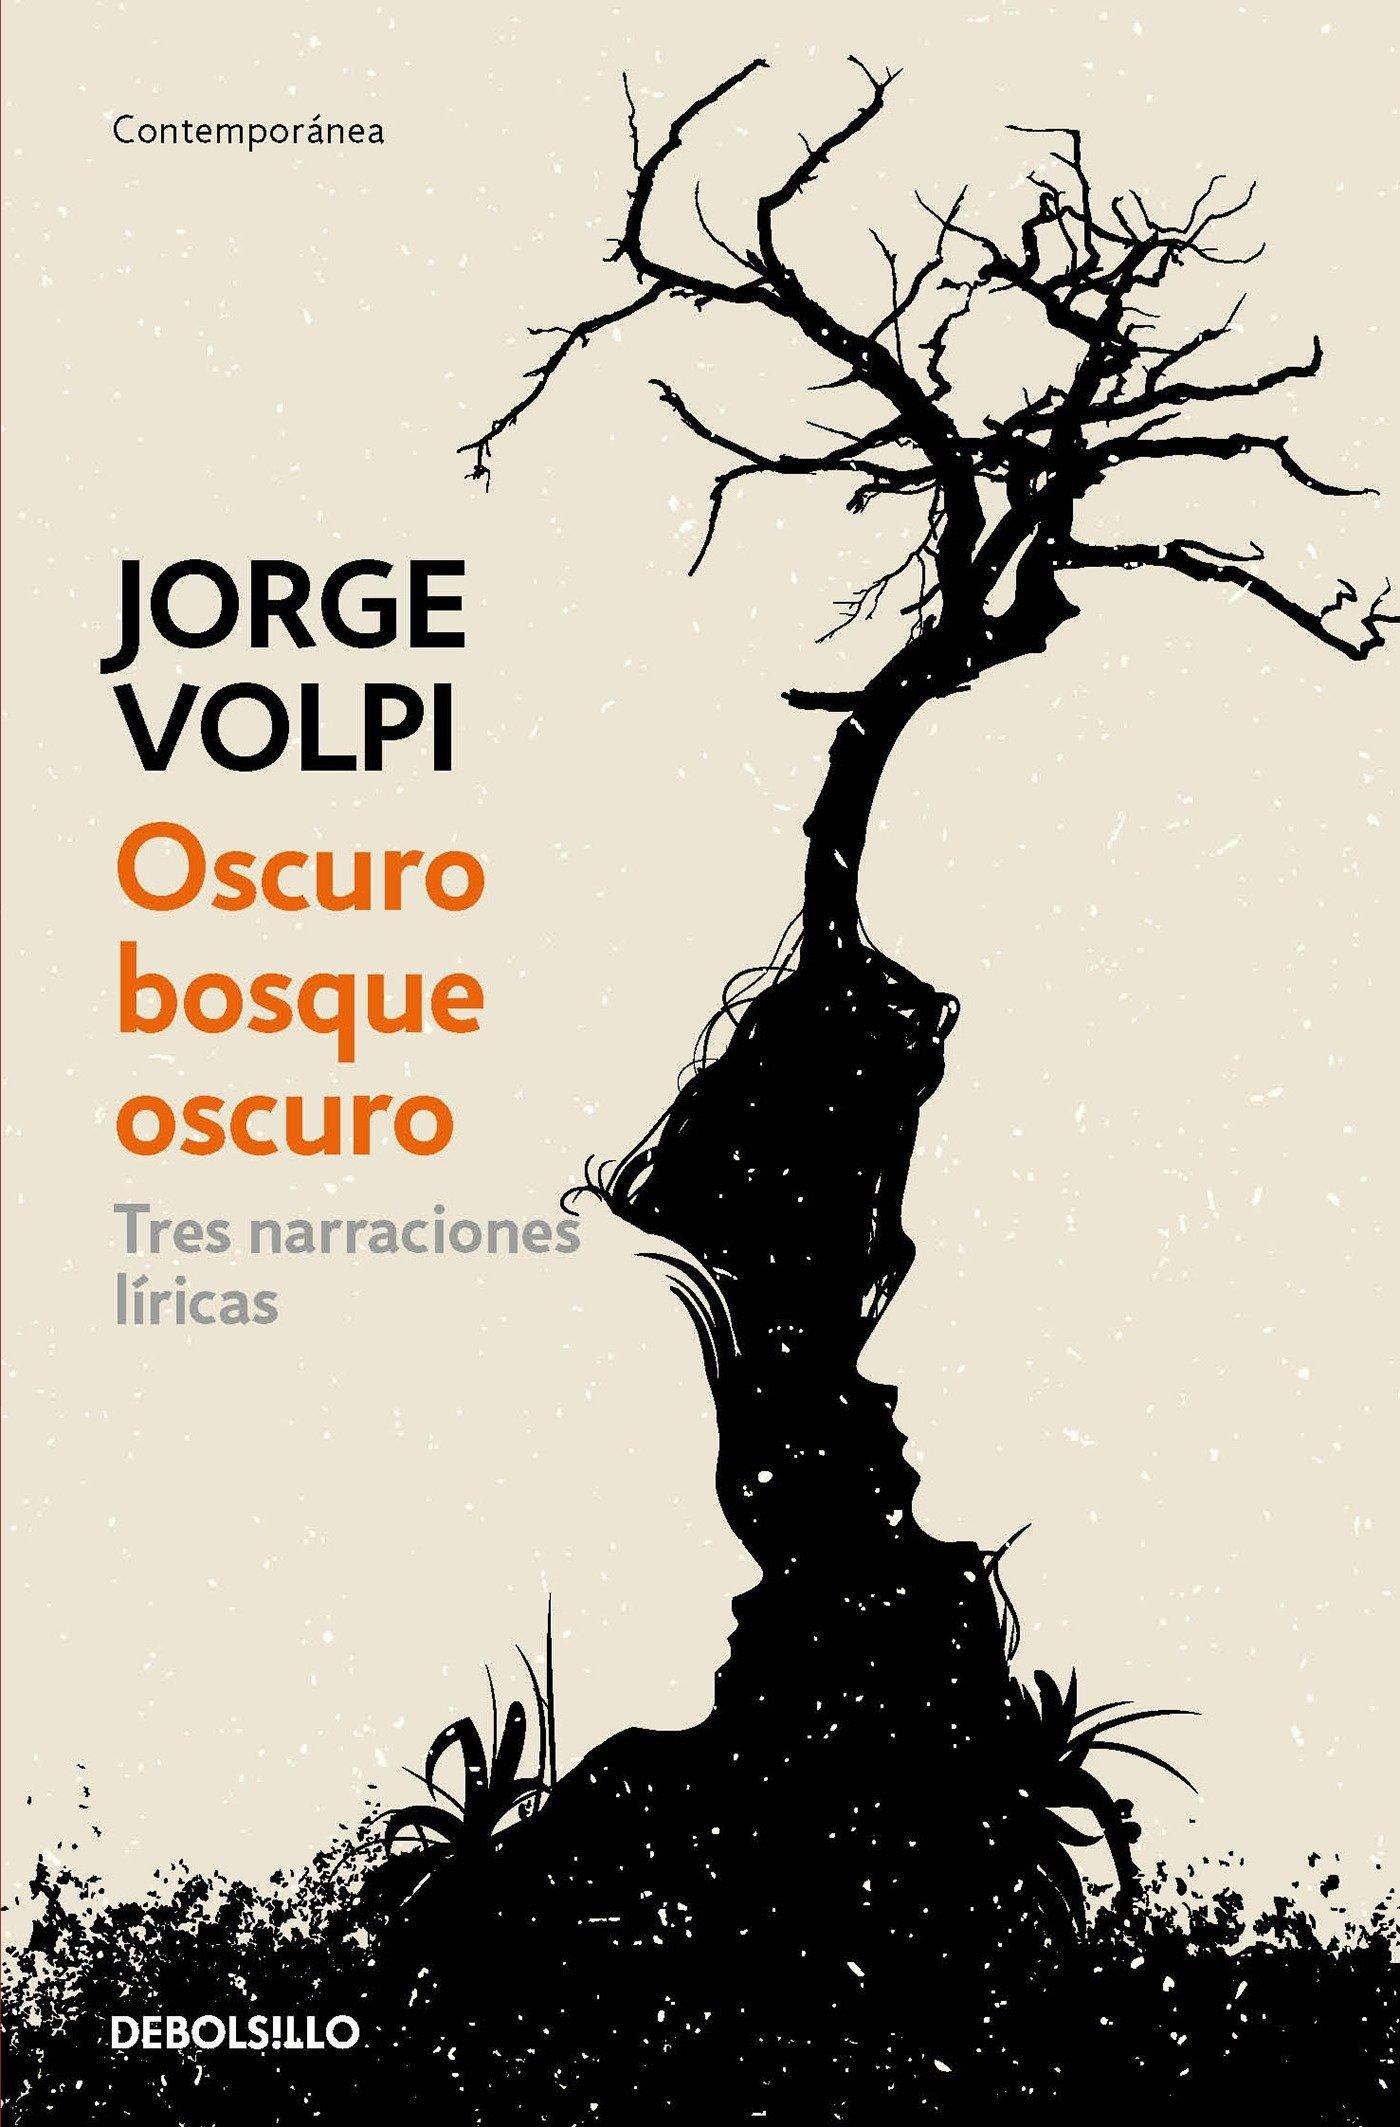 Download Oscuro bosque oscuro: Tres narraciones líricas / Dark Forest: Three Lyrical Narratives (Spanish Edition) PDF